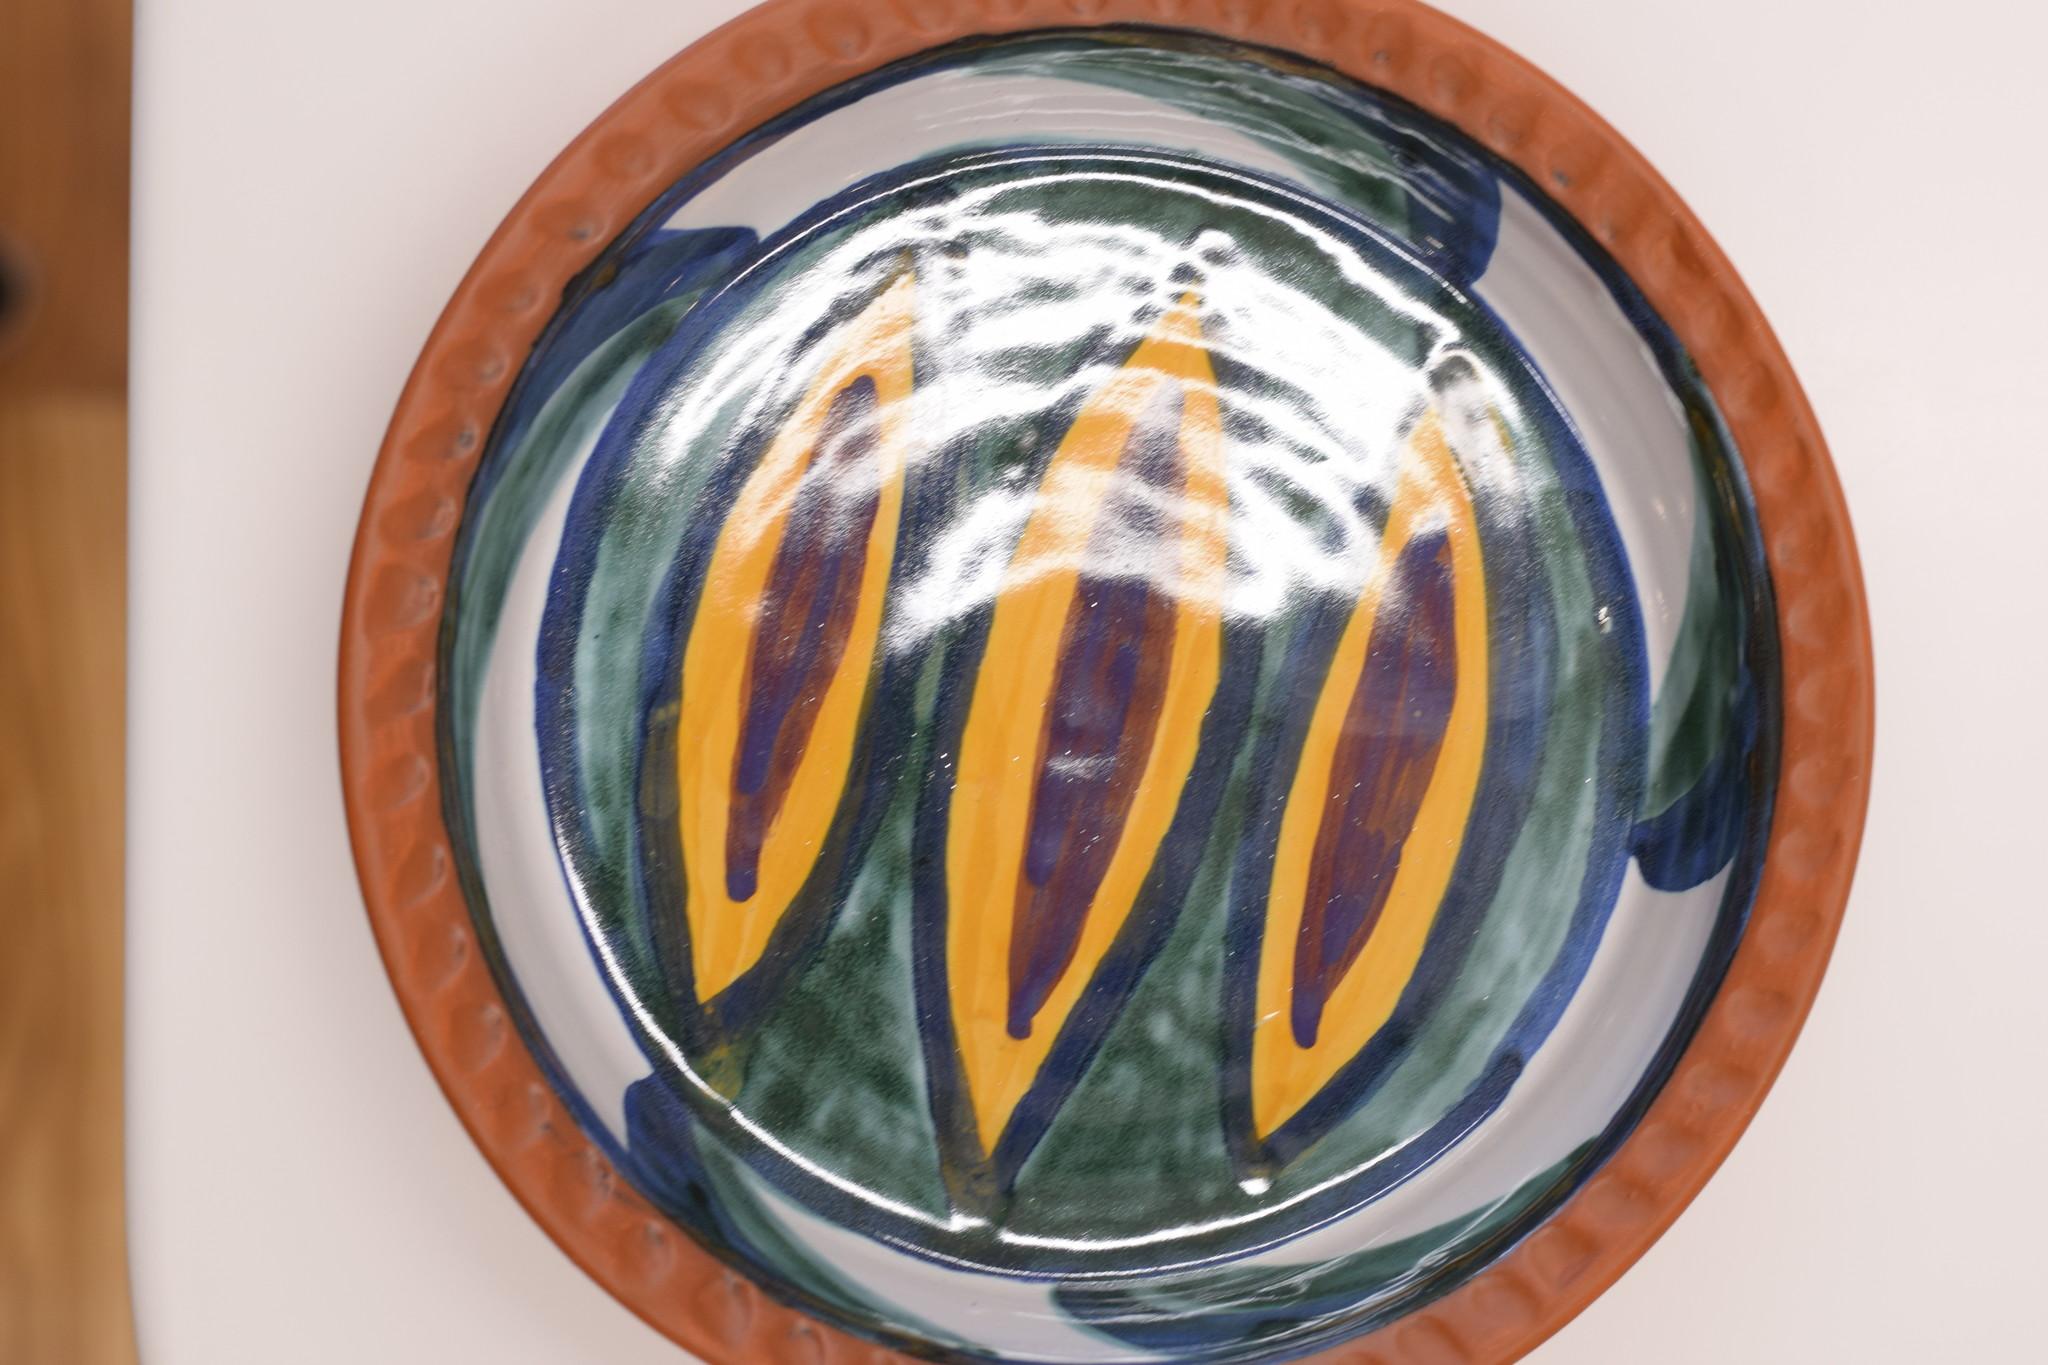 Berea College Crafts Pie Plate